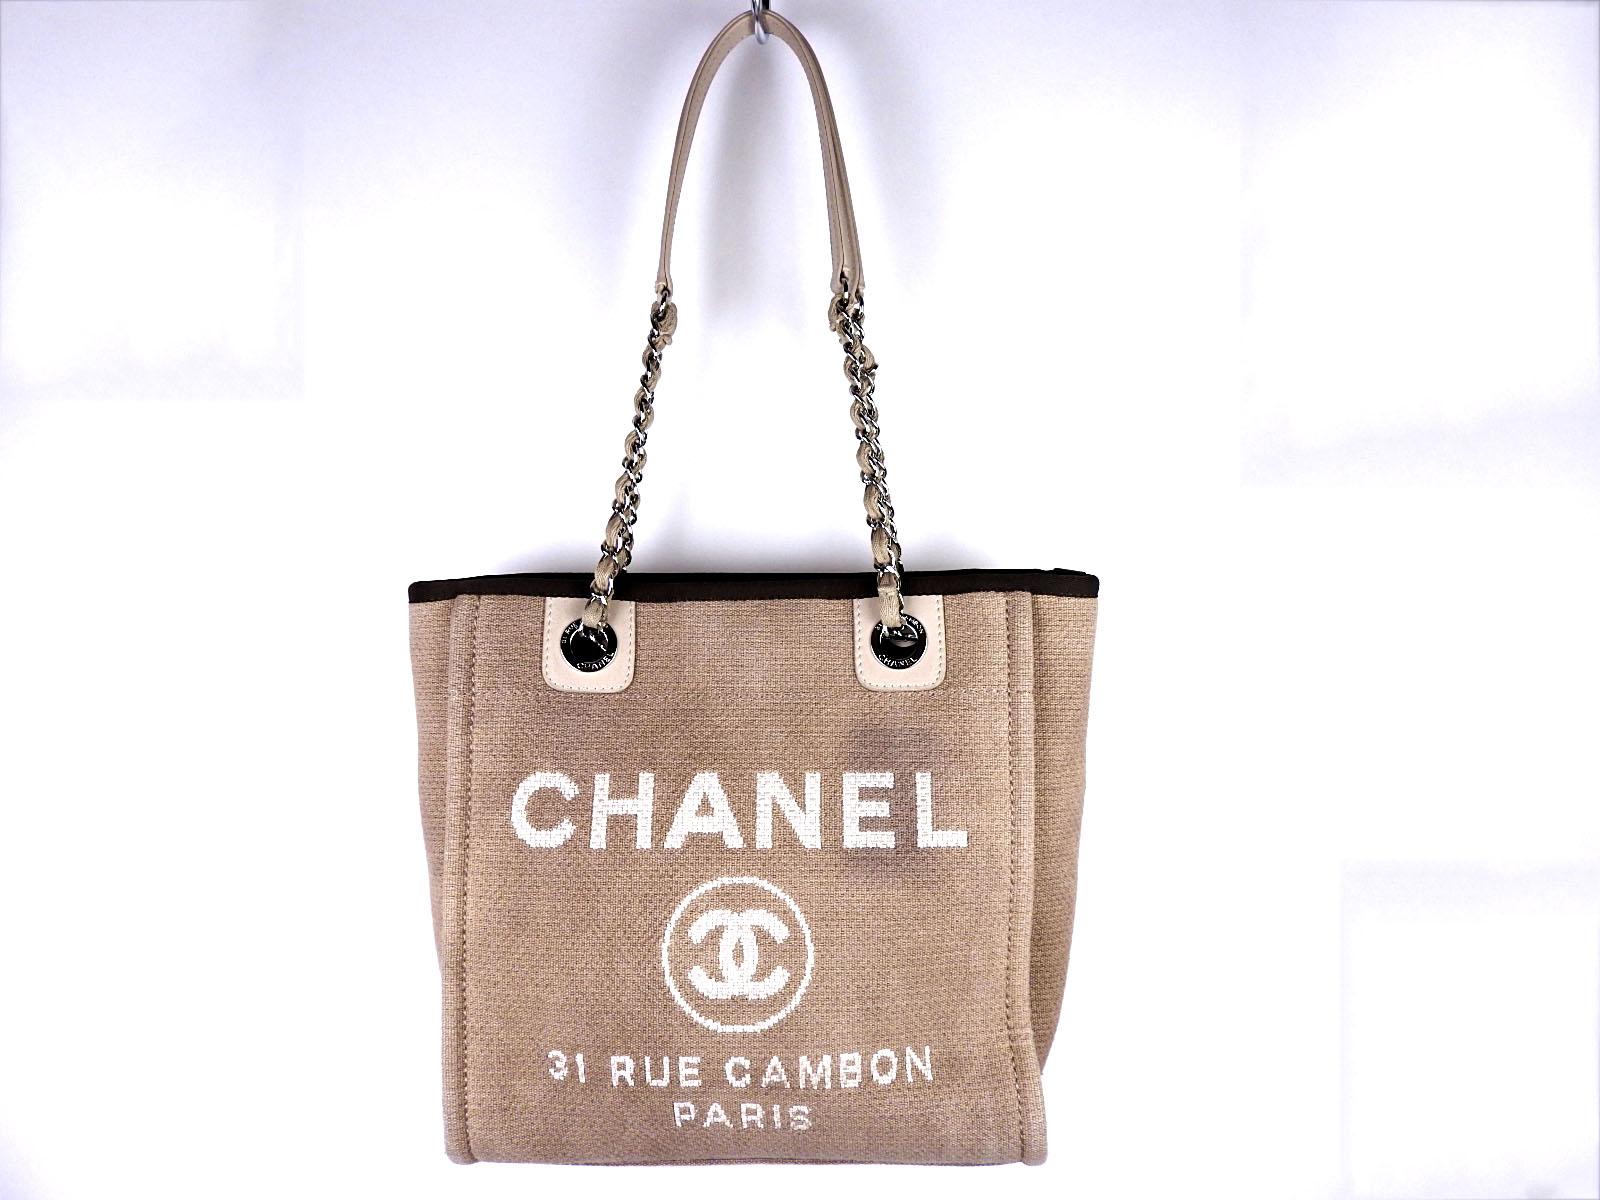 e94cd0fc5068 Auth CHANEL Deauville PM CC Chain Shoulder Tote Bag Canvas Beige A66939  A-4736